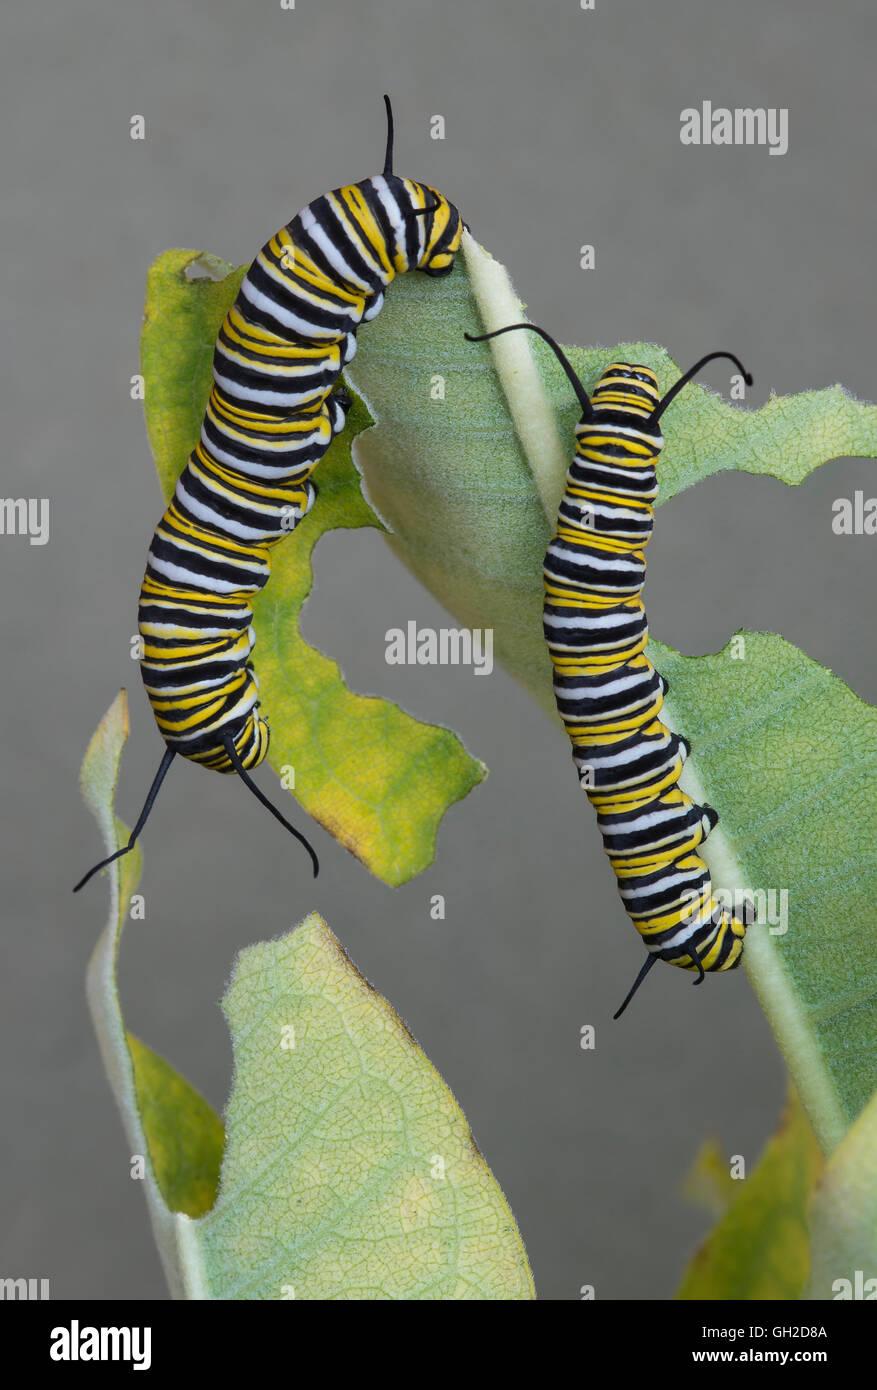 Monarch-Schmetterling Raupen Danaus Plexippus Fütterung auf gemeinsamen Seidenpflanze Asclepias Syriaca E USA Stockbild